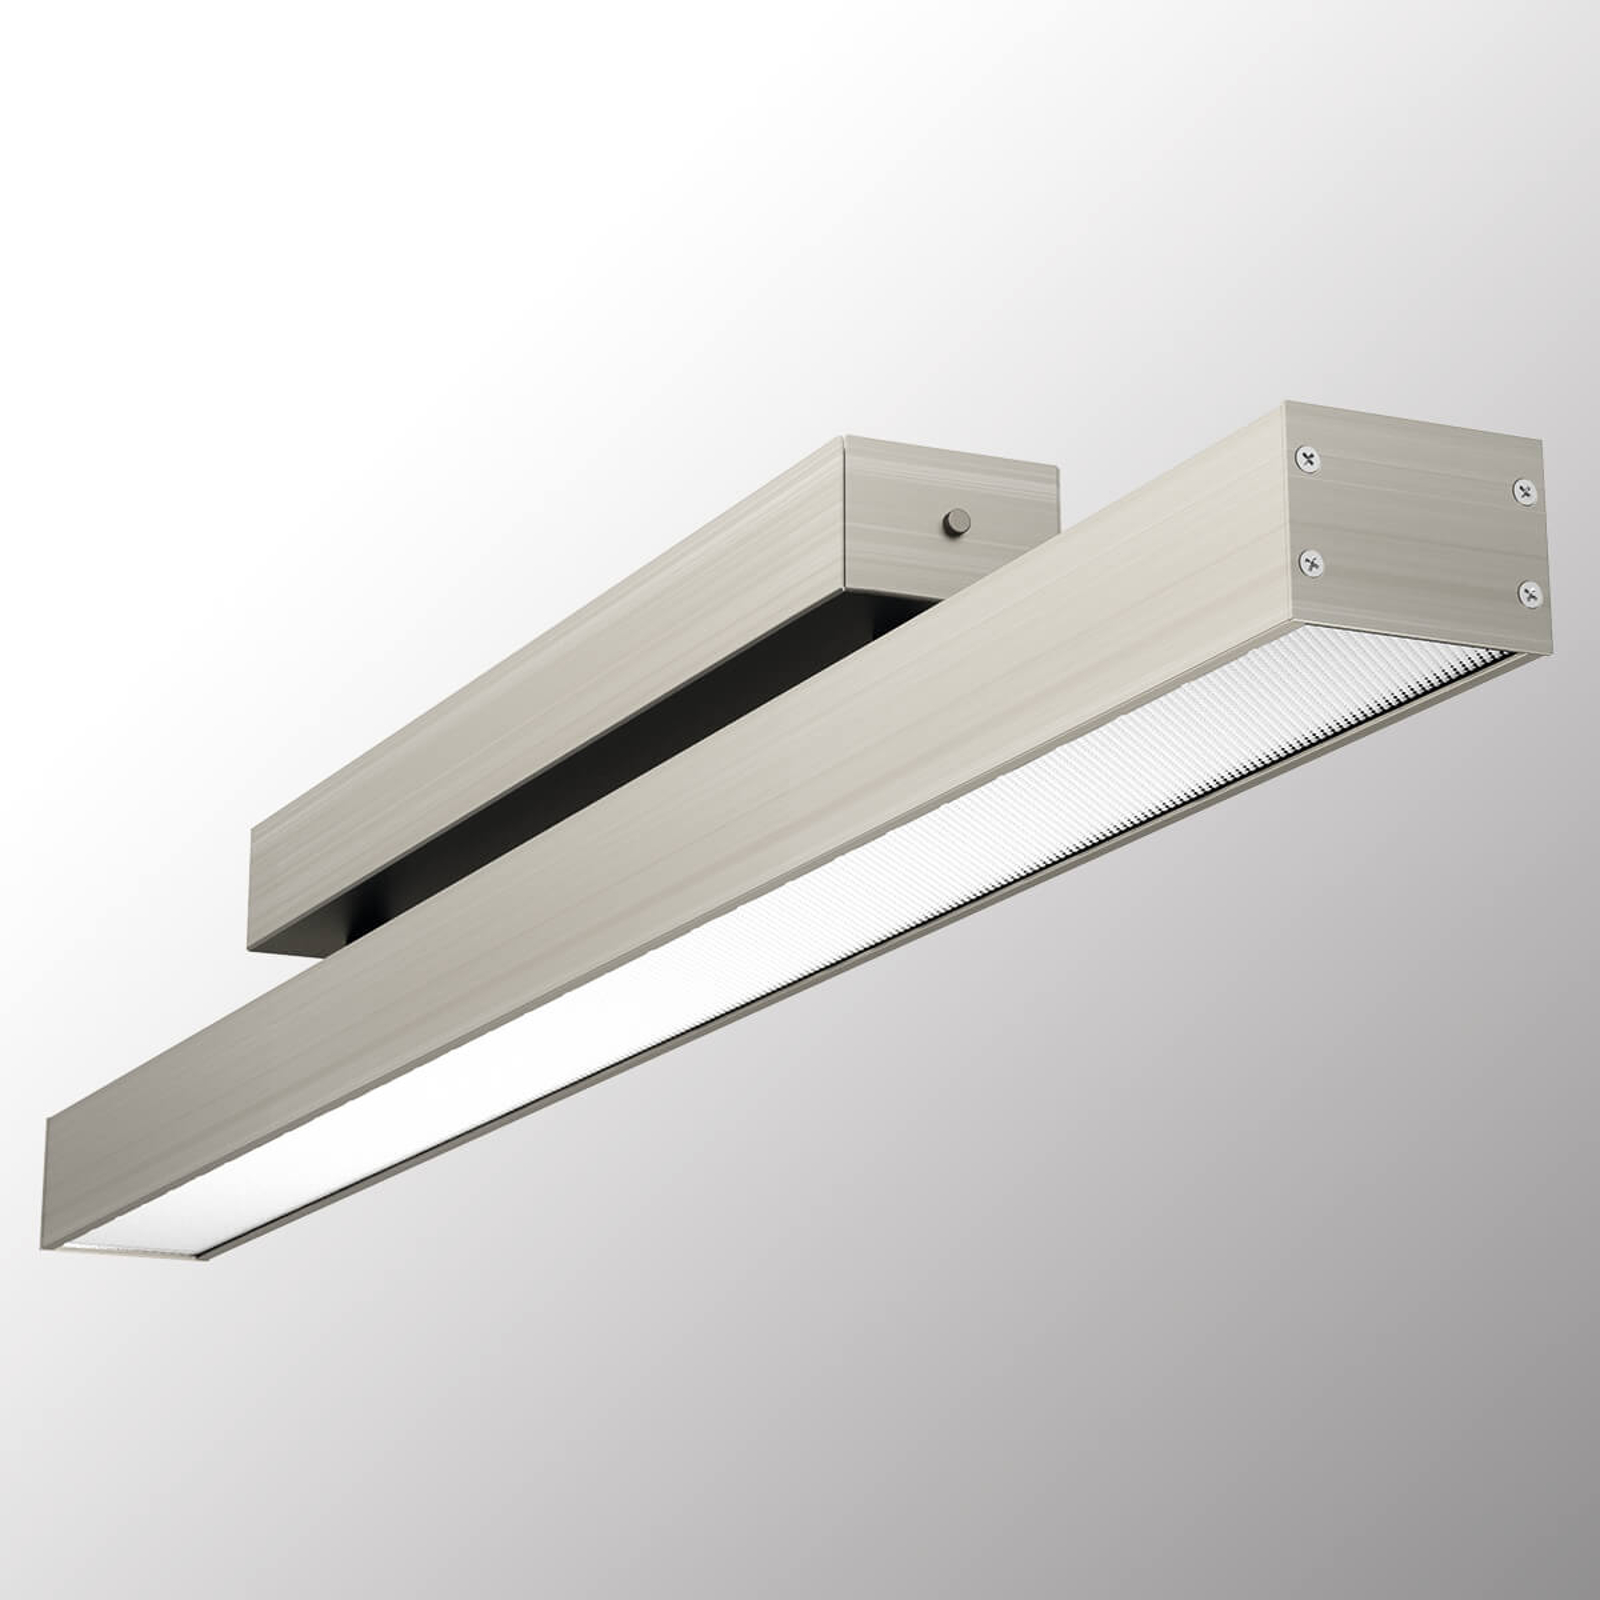 Blendfreie LED-Deckenleuchte Office One